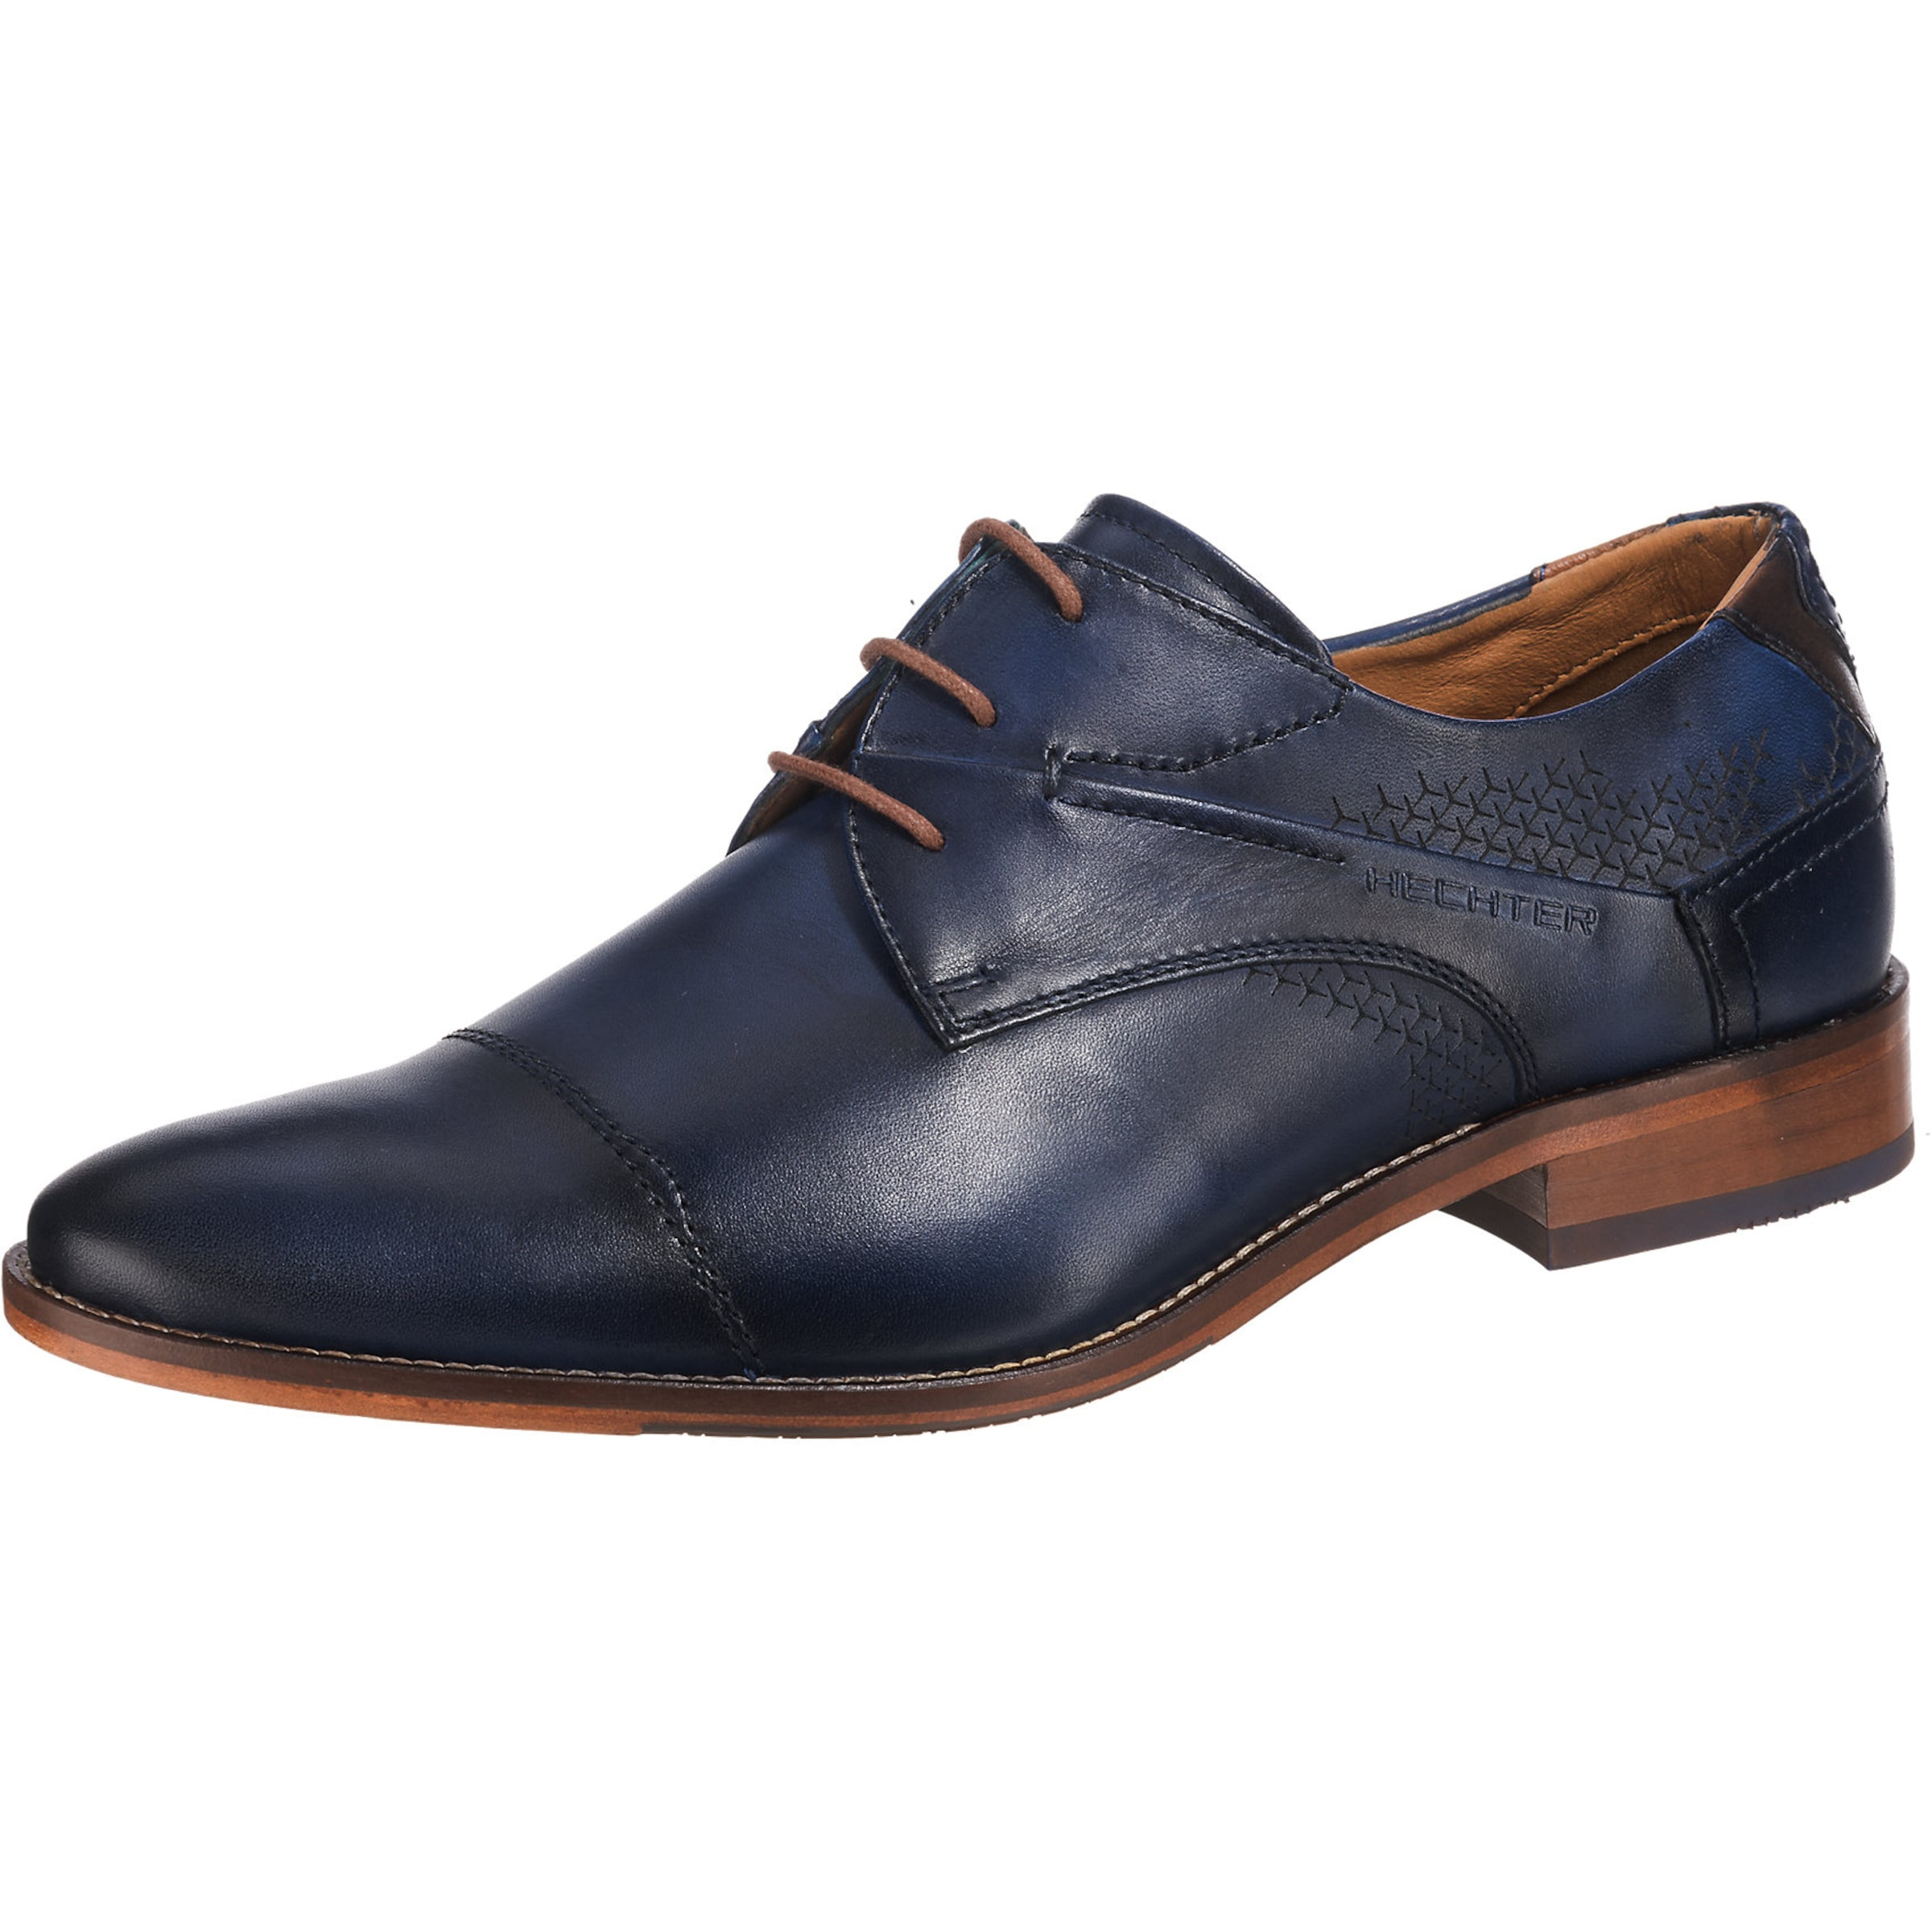 DANIEL HECHTER Business Schuhe Günstige und langlebige Schuhe